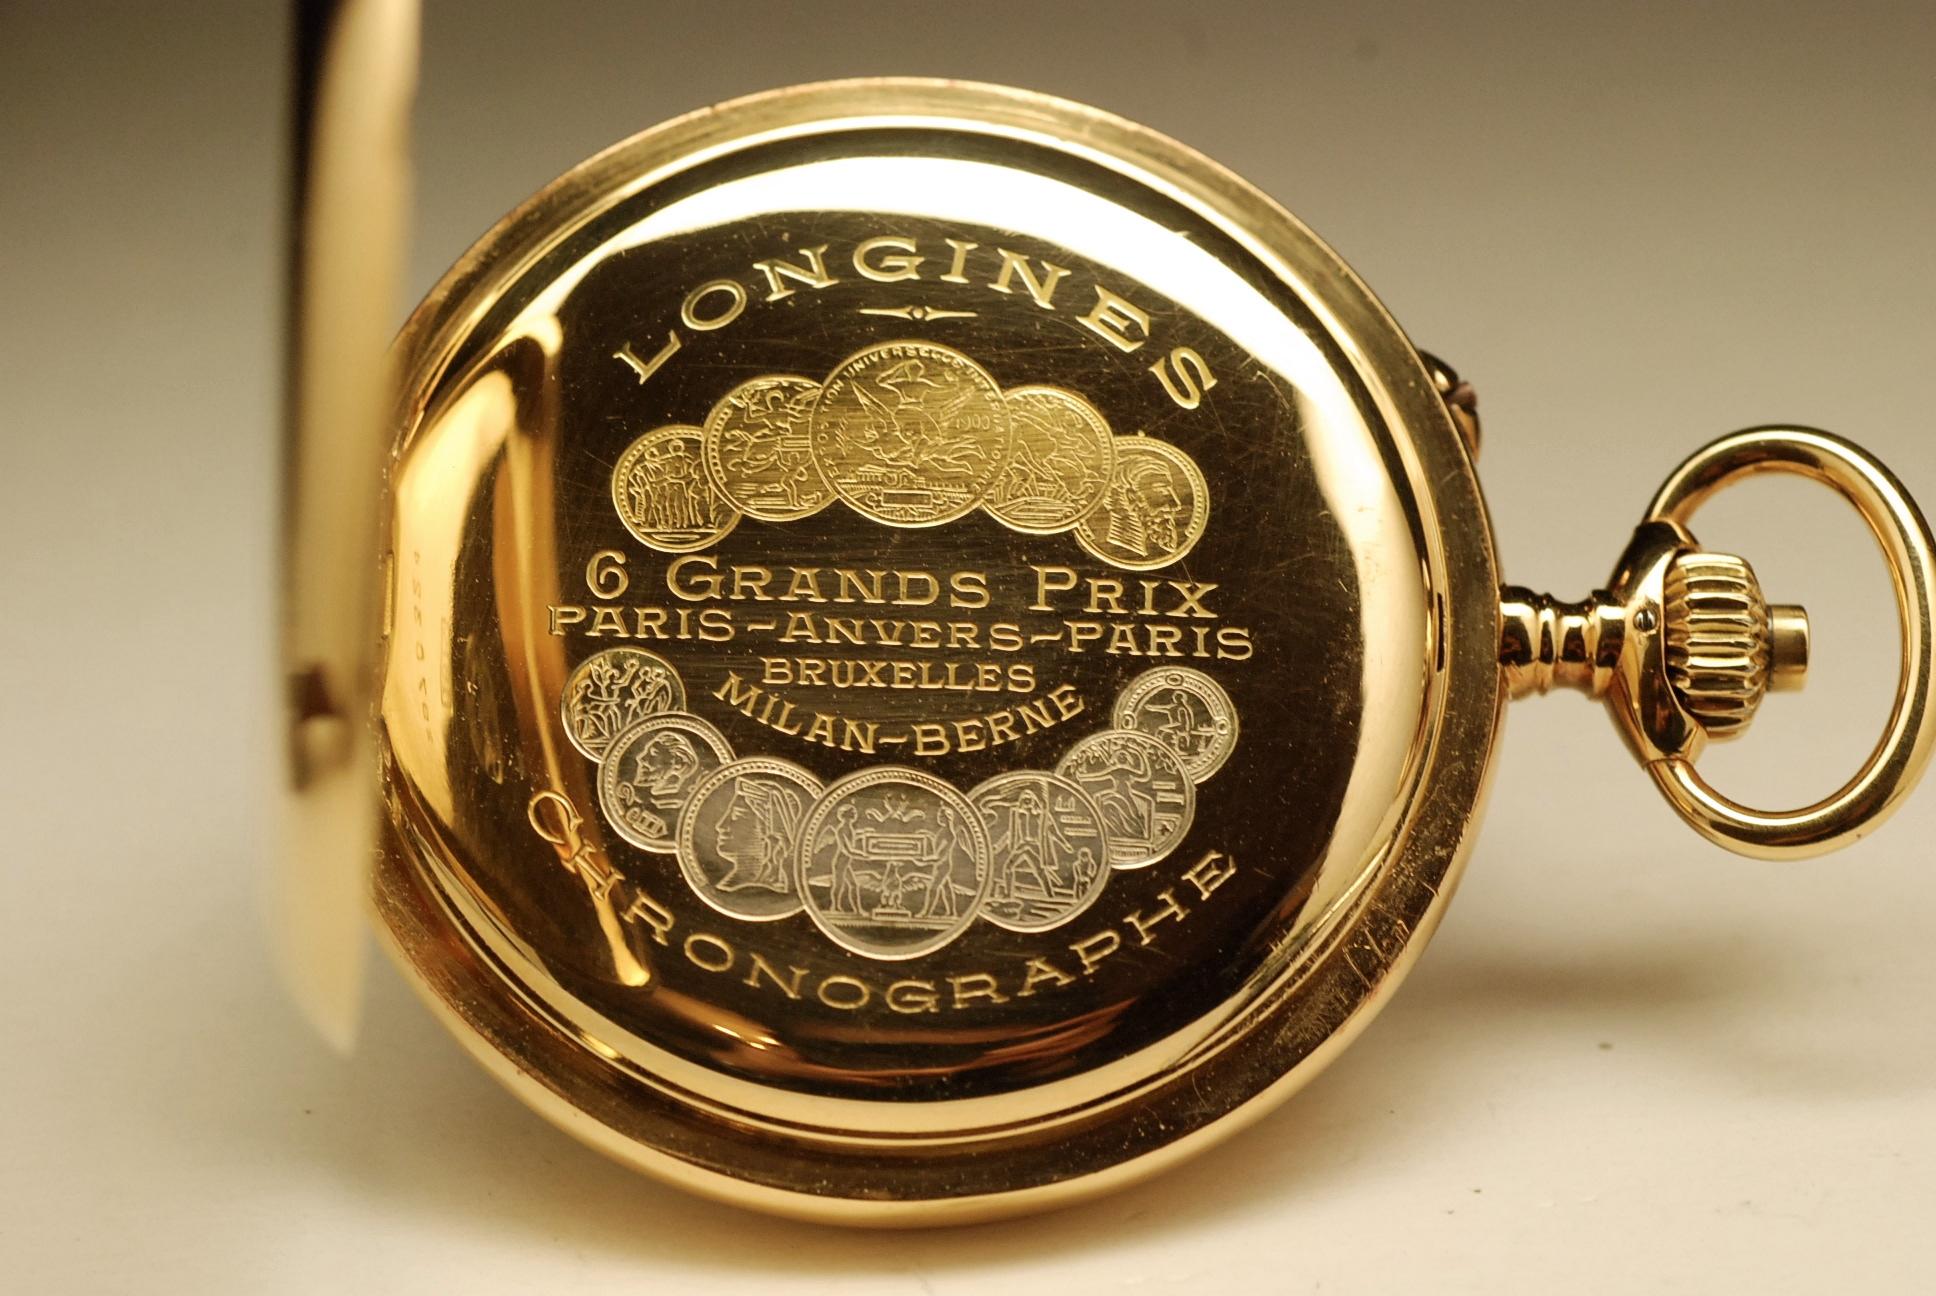 ancienne montre gousset longines chronographe 1912 en or. Black Bedroom Furniture Sets. Home Design Ideas